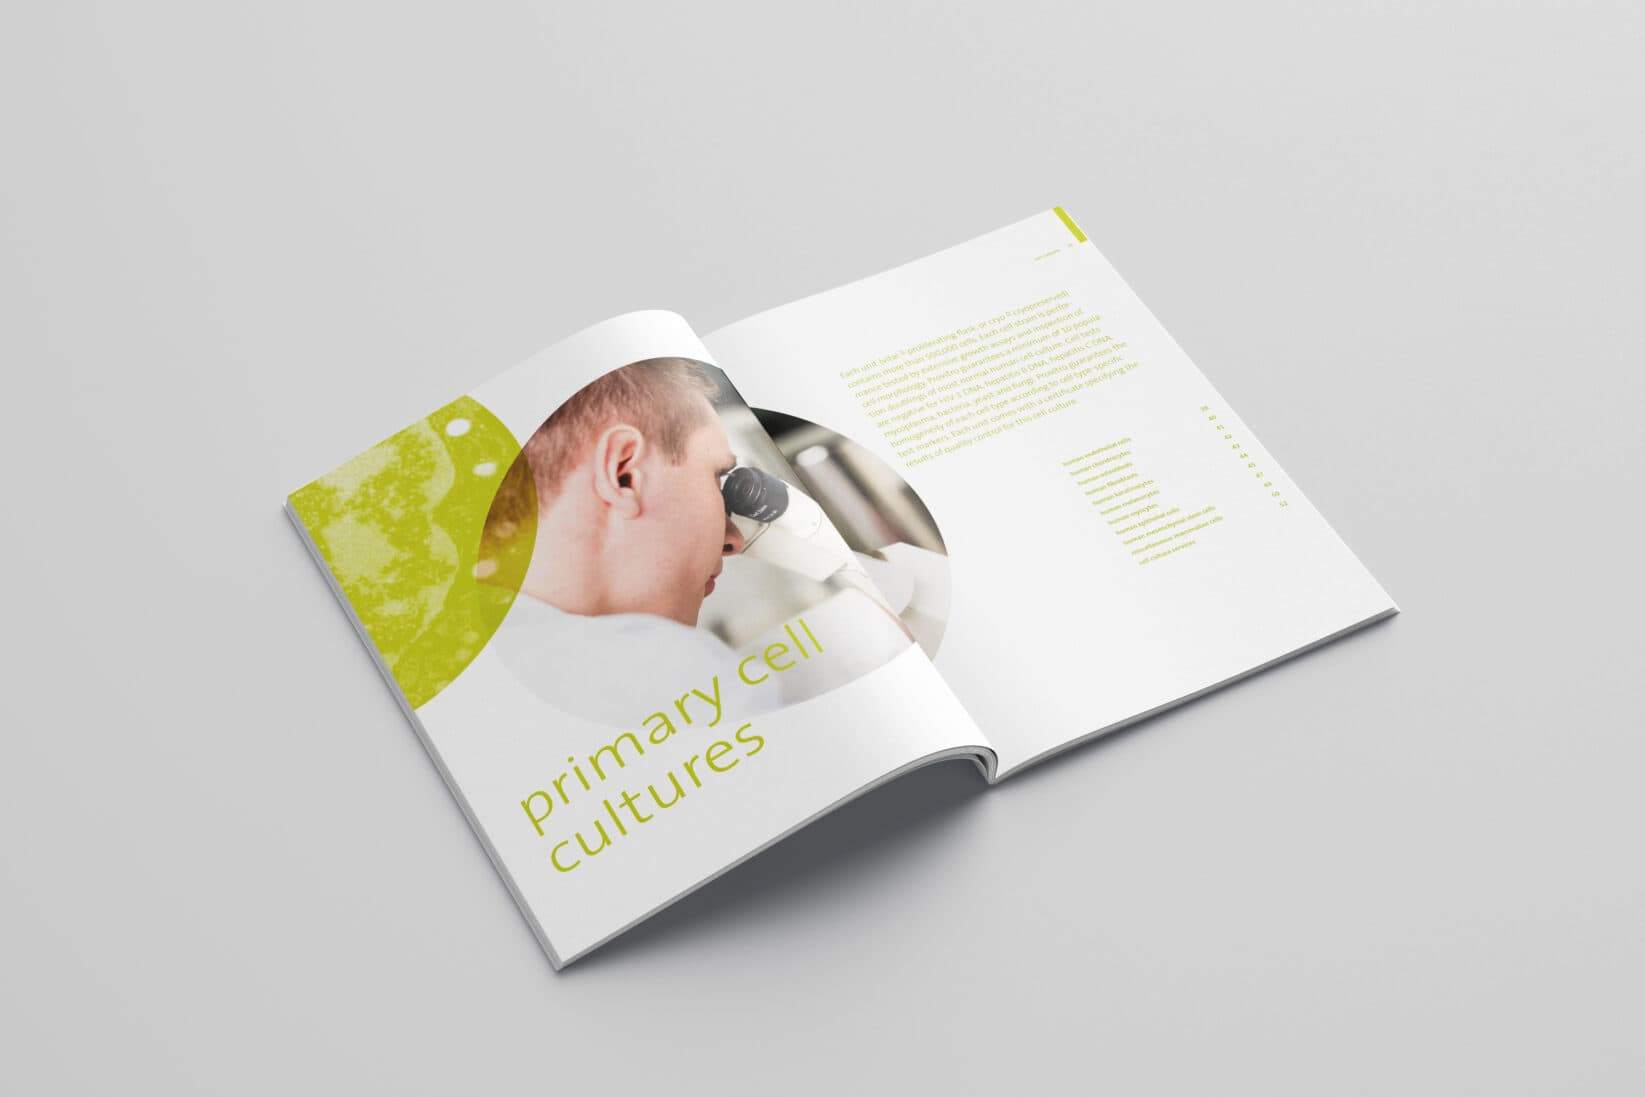 provitro Corporate Design Katalog Innenseite